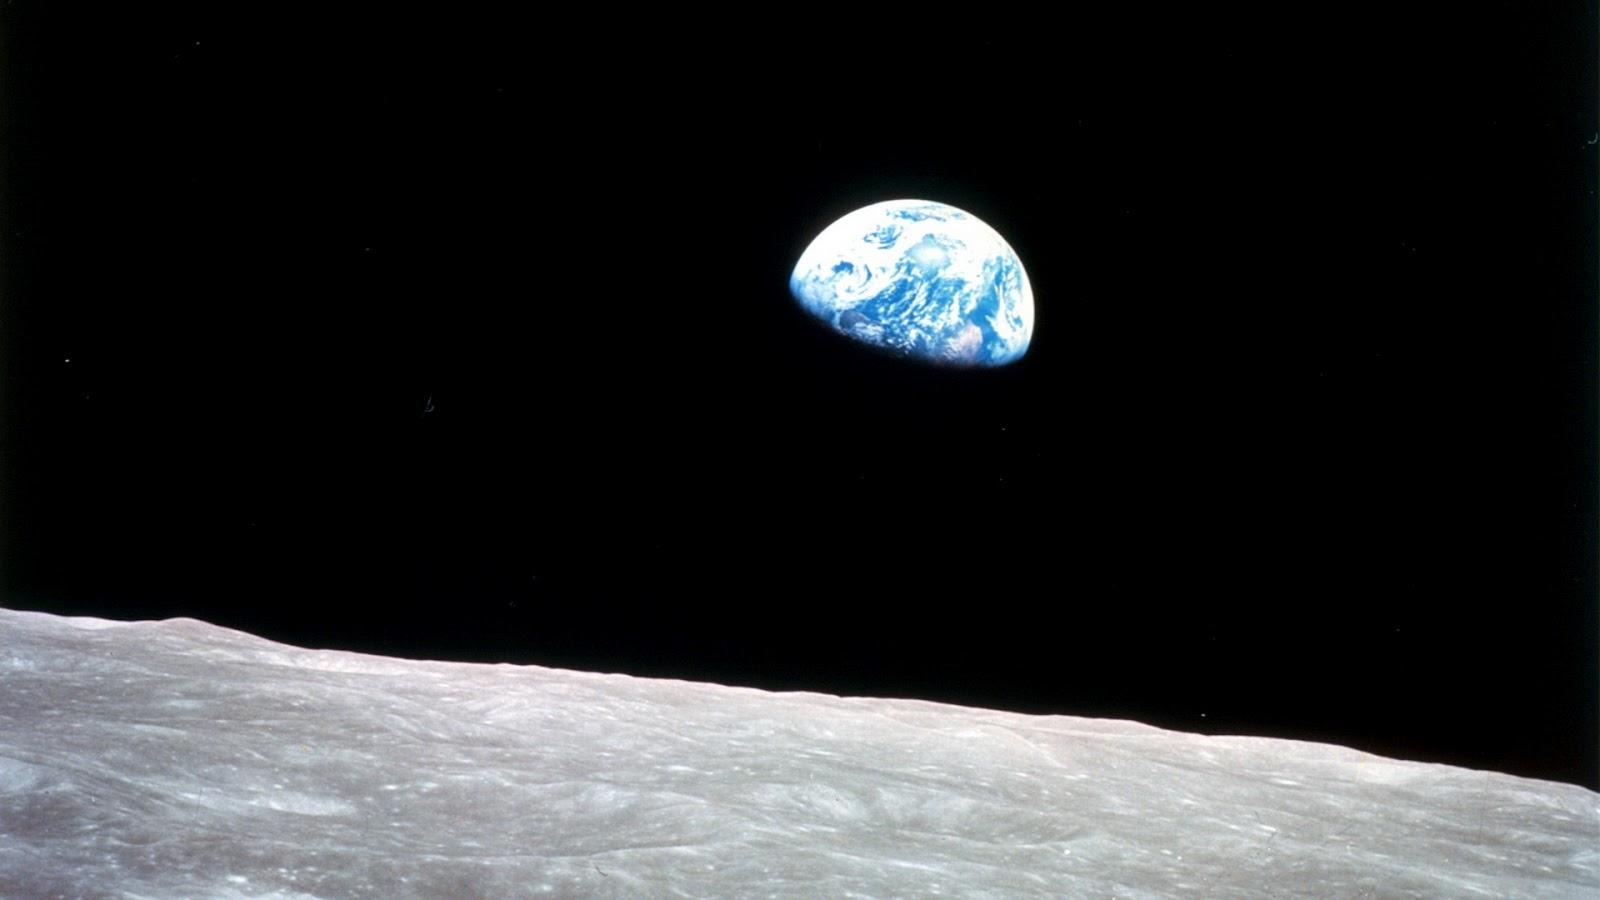 http://1.bp.blogspot.com/-b9fHODAztEw/UCY3c7bpg2I/AAAAAAAAMbU/5axuT5fRKVY/s1600/Earth-and-Moon-Viewer.jpg